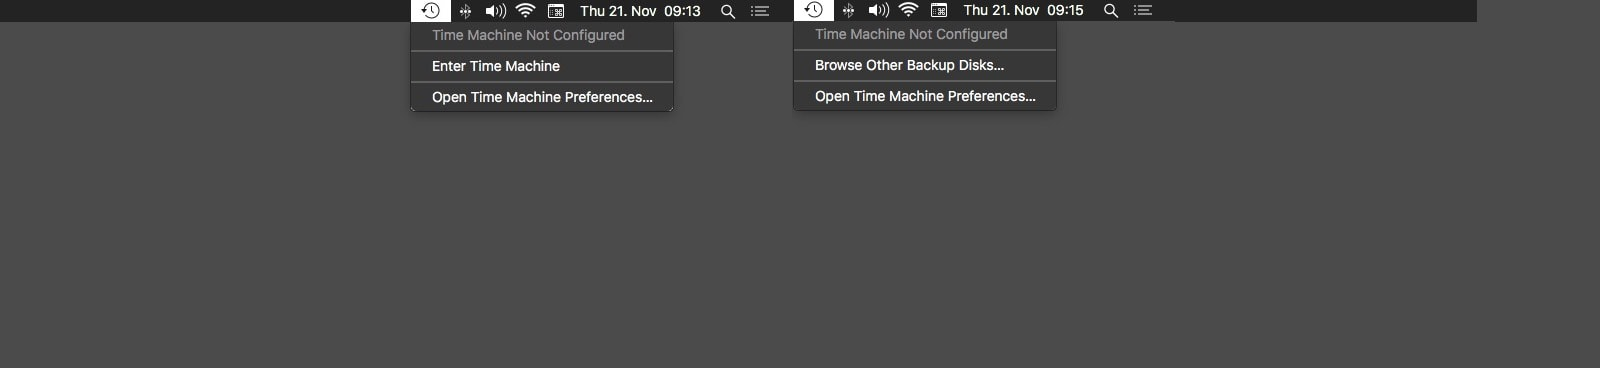 Time Machine offers hidden Mac menu bar options, too.